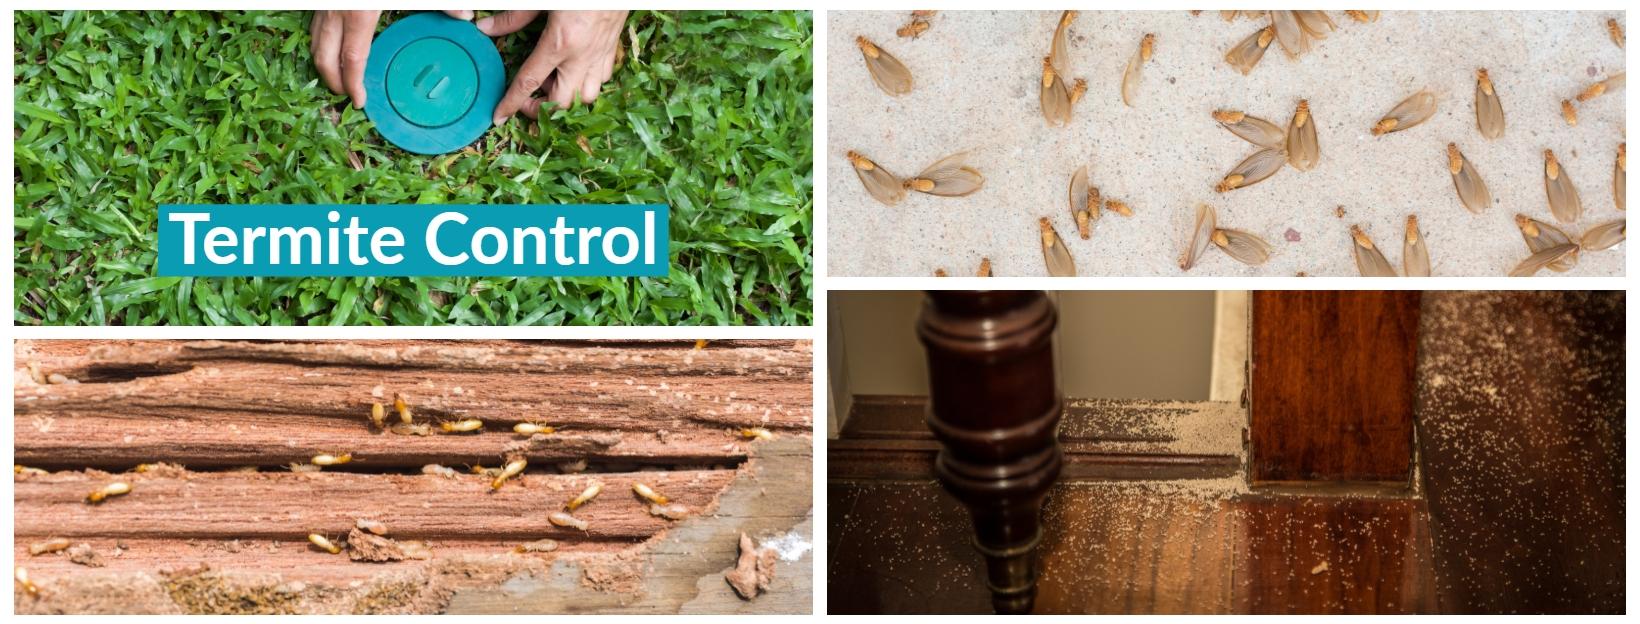 Termite Treatment Palm Beach | Termite Control | Island